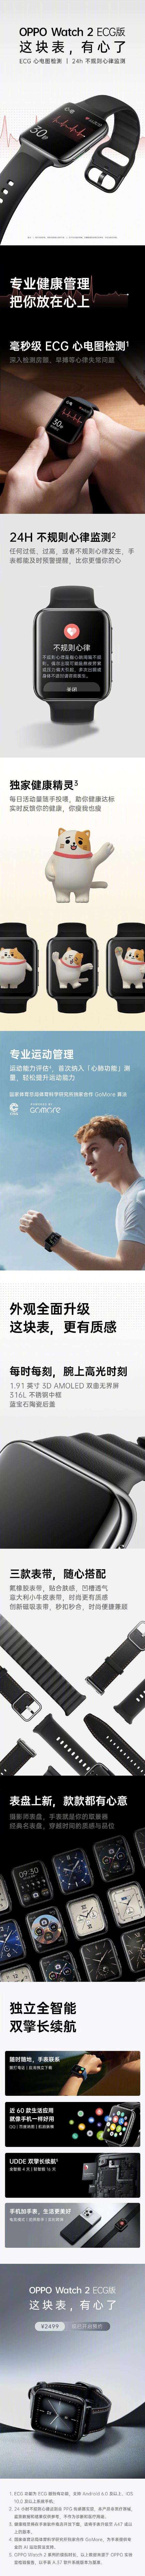 OPPO Watch 2 ECG版发布:毫秒级心电图检测